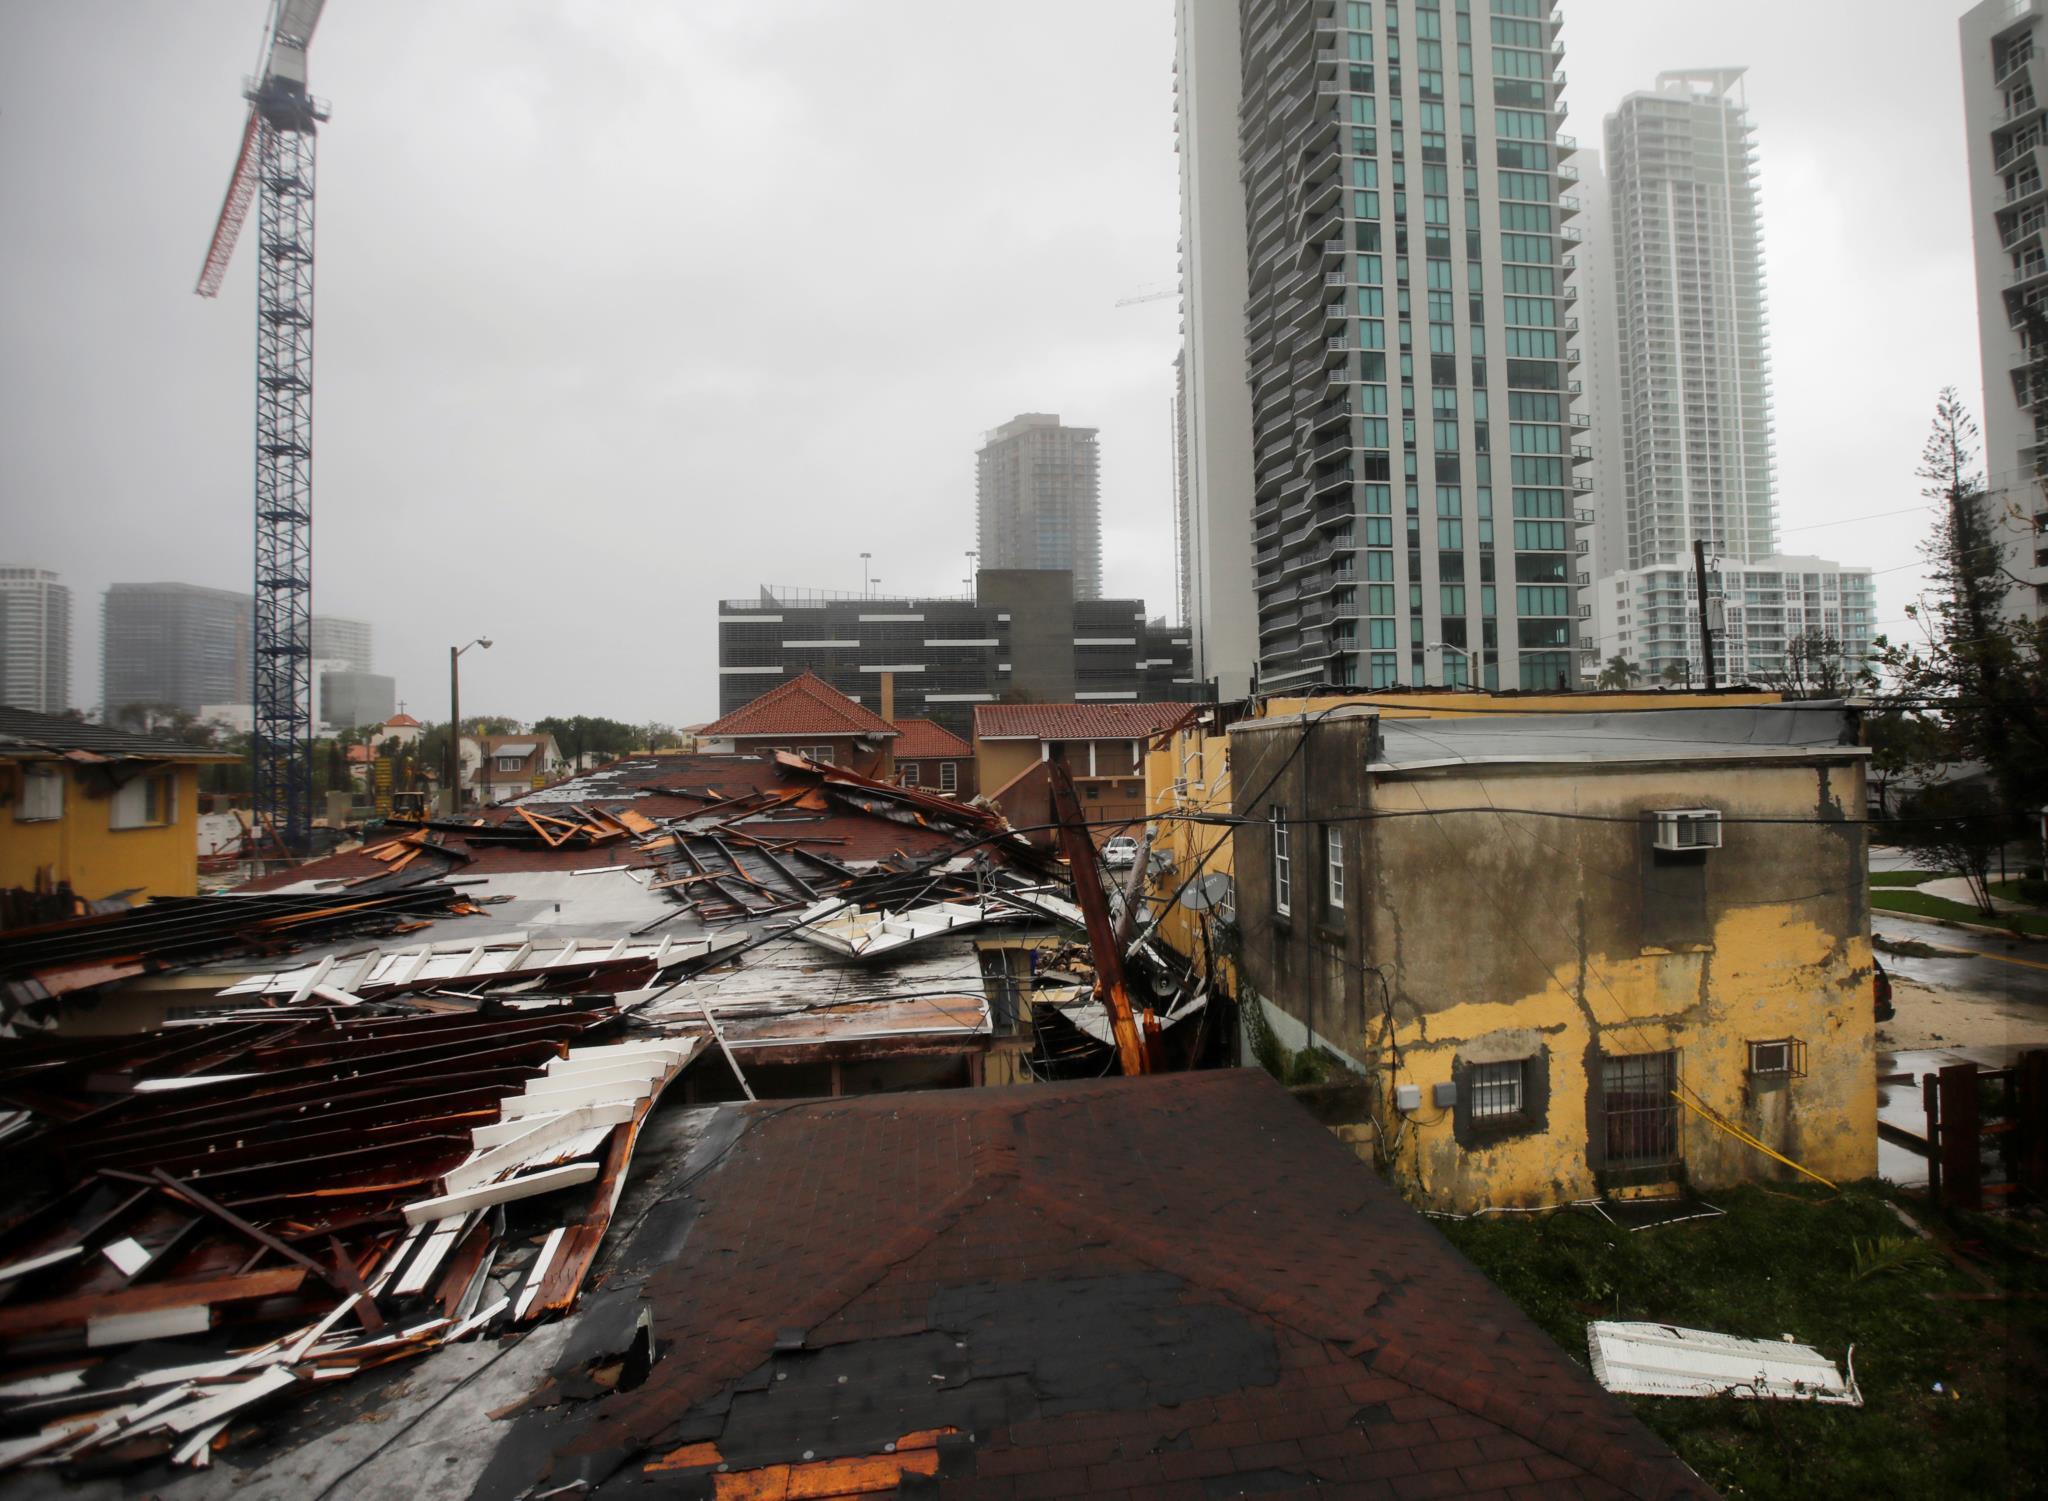 Telhados destruídos numa zona residencial de Miami, nos Estados Unidos